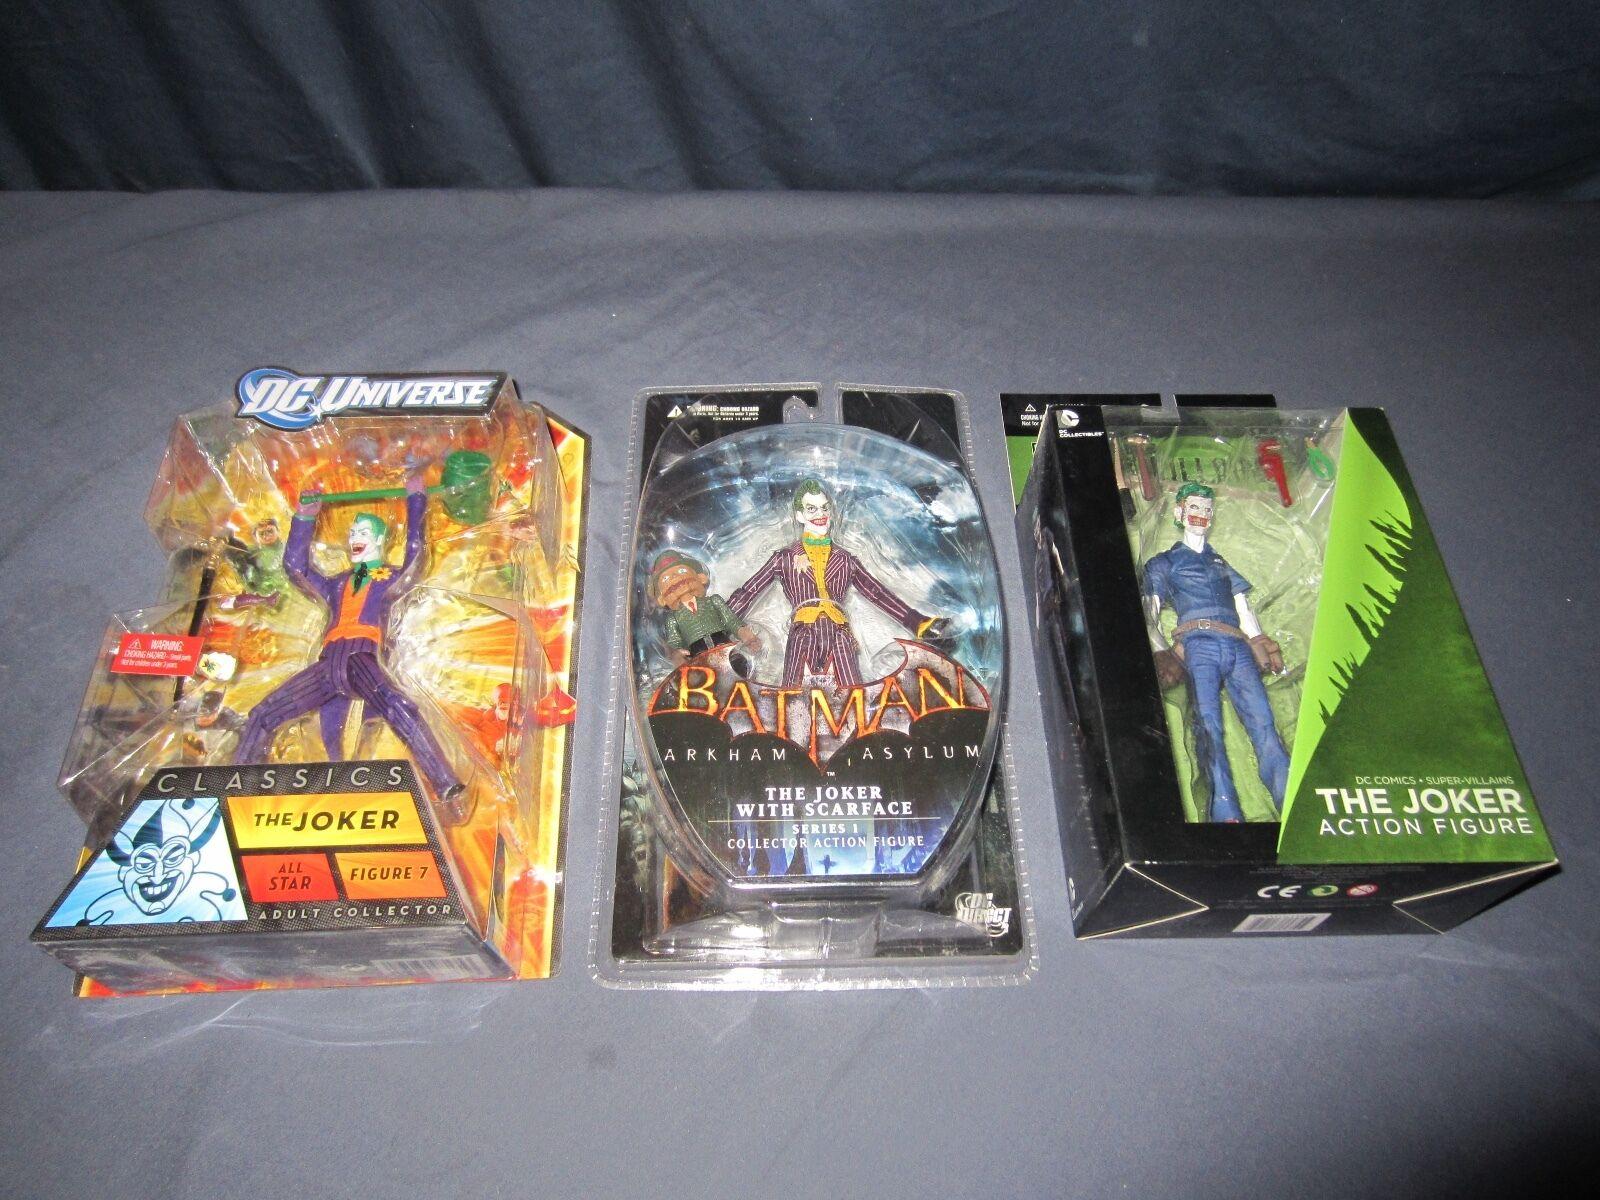 BATMAN ARKHAM ASYLUM JOKER SCARFace DC UNIVERSE ALL STAR COMICS SUPER VILLAINS